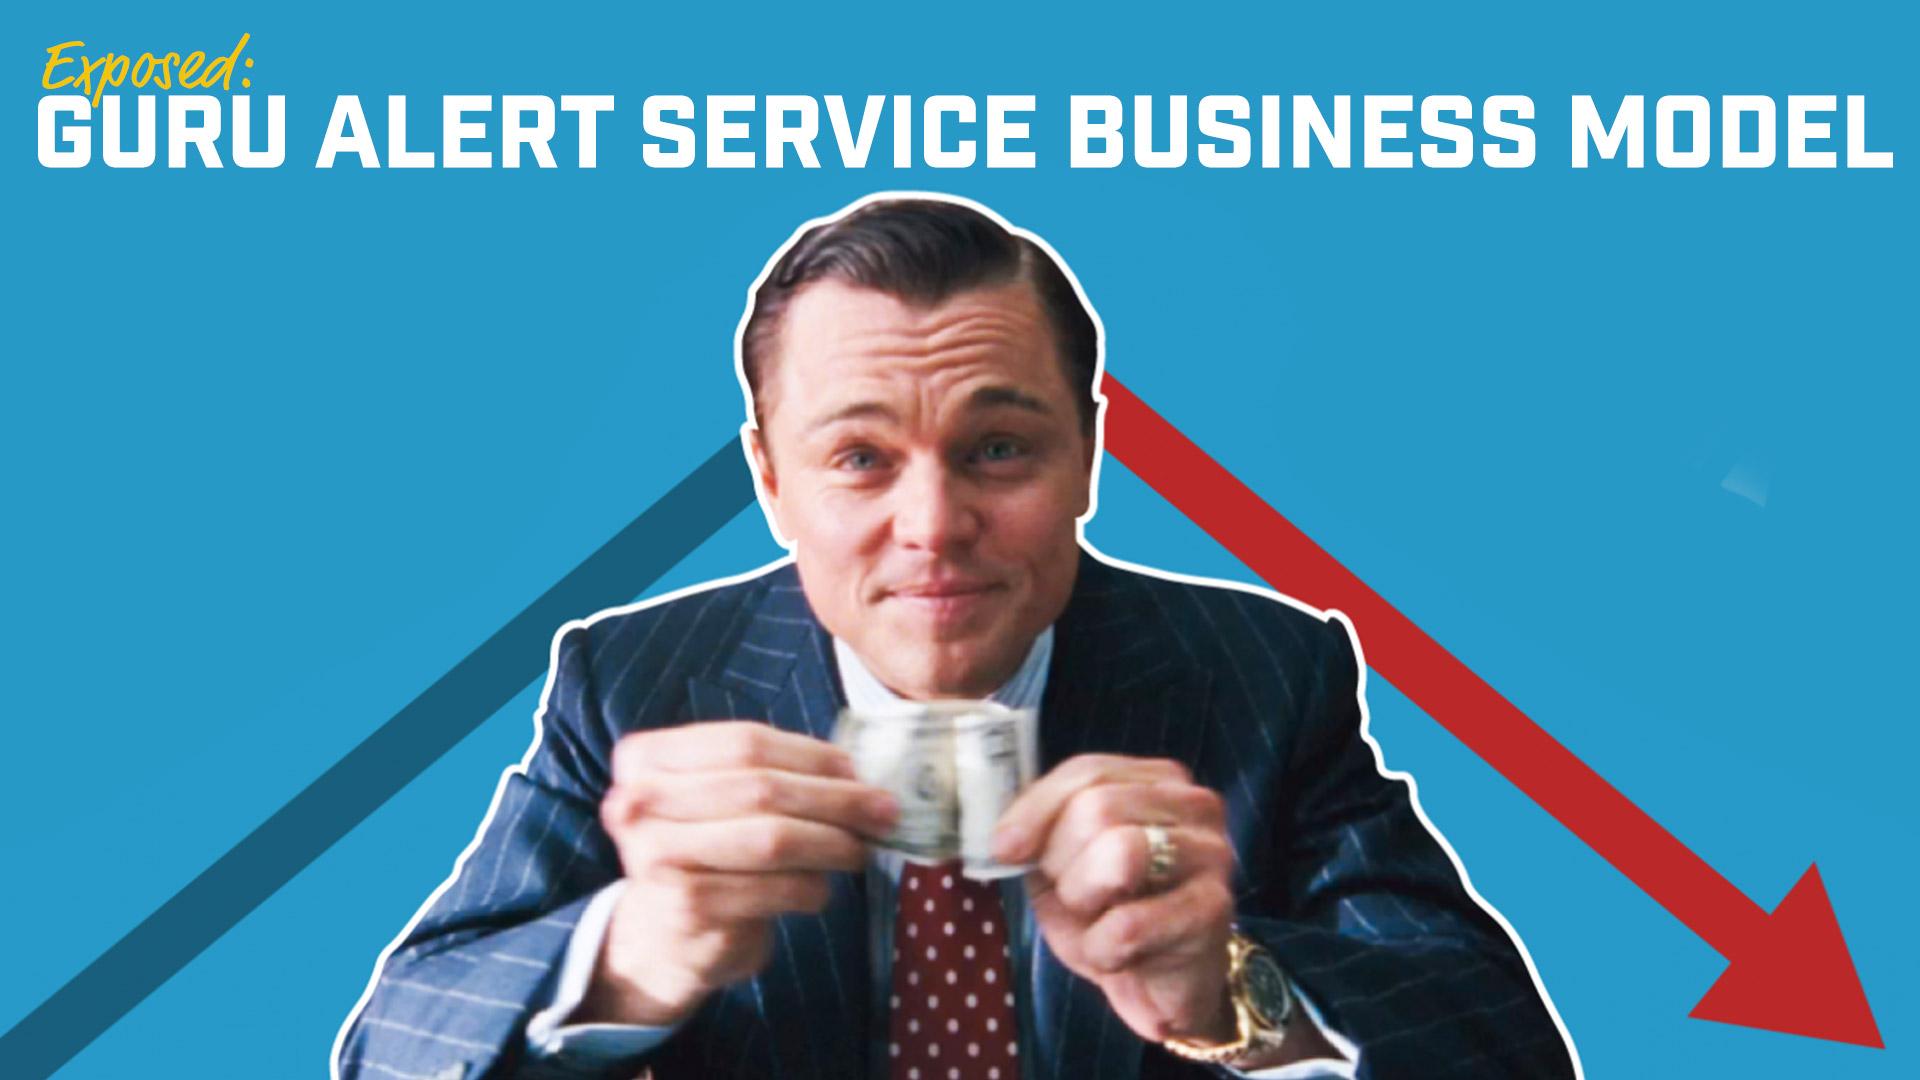 Exposed: Guru Alert Service Business Model